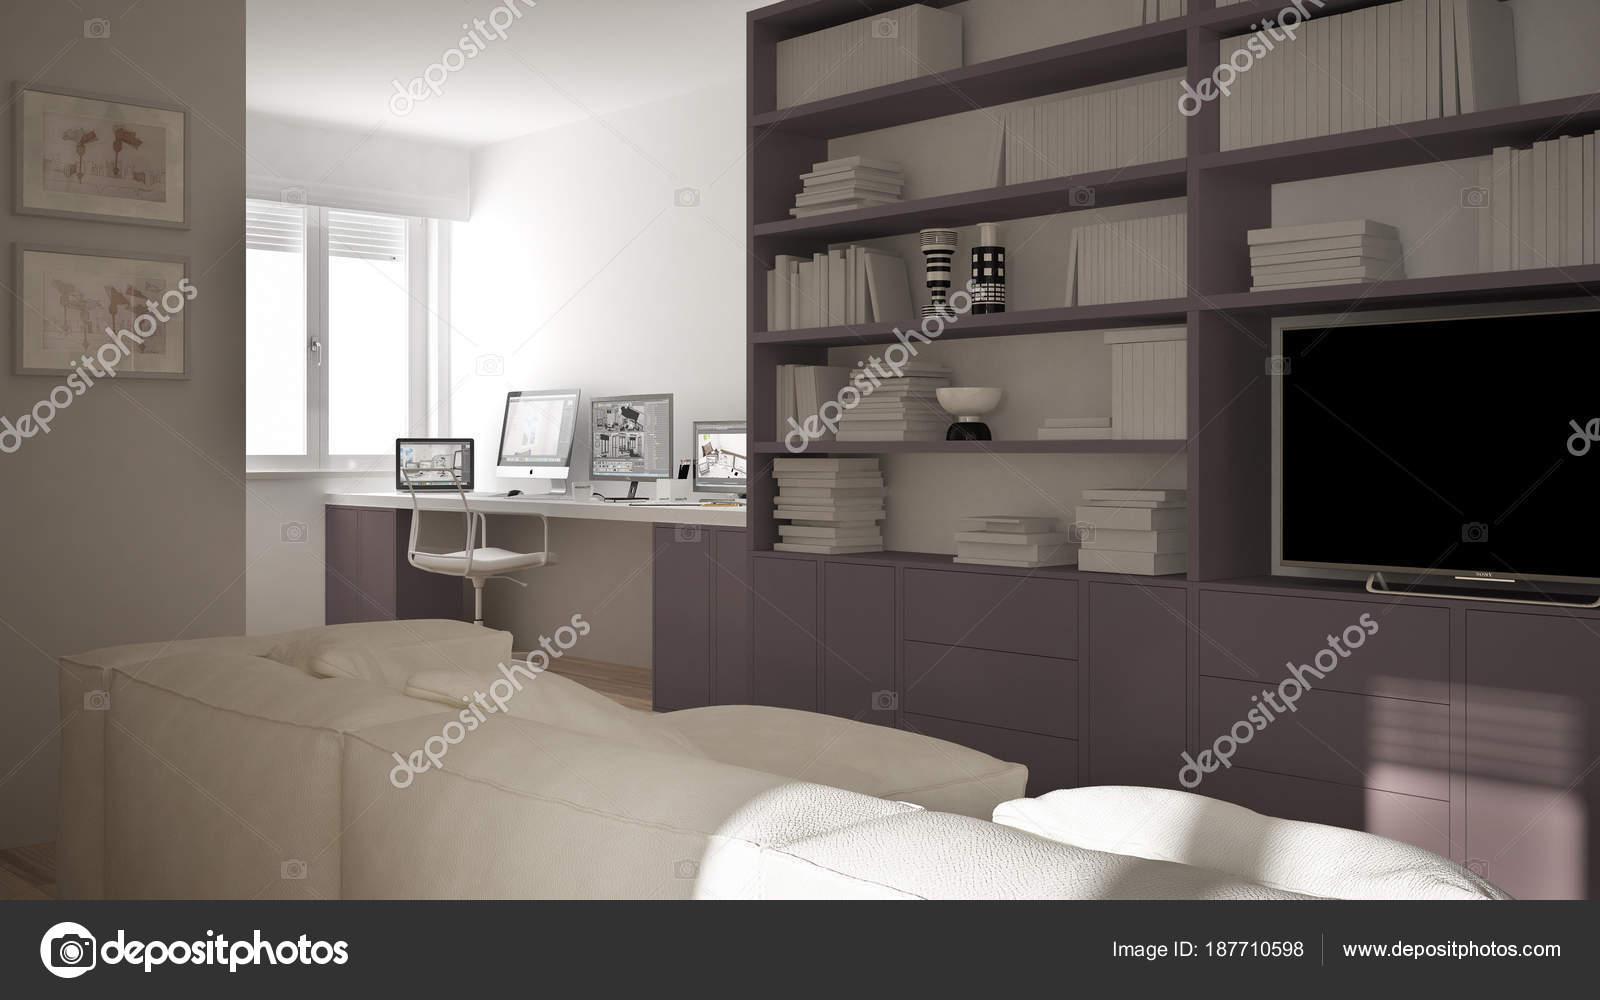 Modern Living Room With Workplace Corner Big Bookshelf And Window Minimal White Red